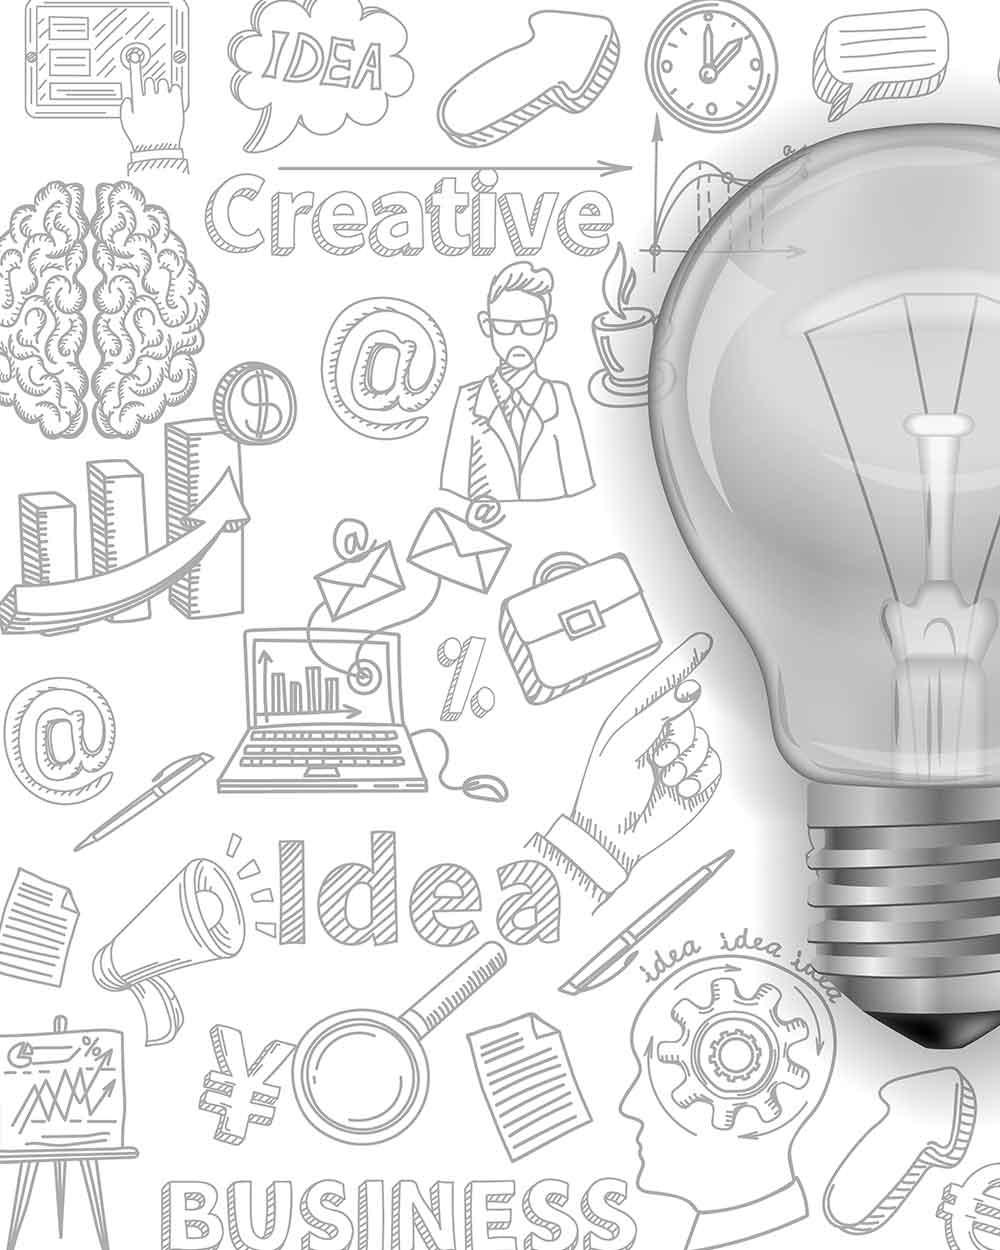 Identity, Brand Strategy & Art Direction